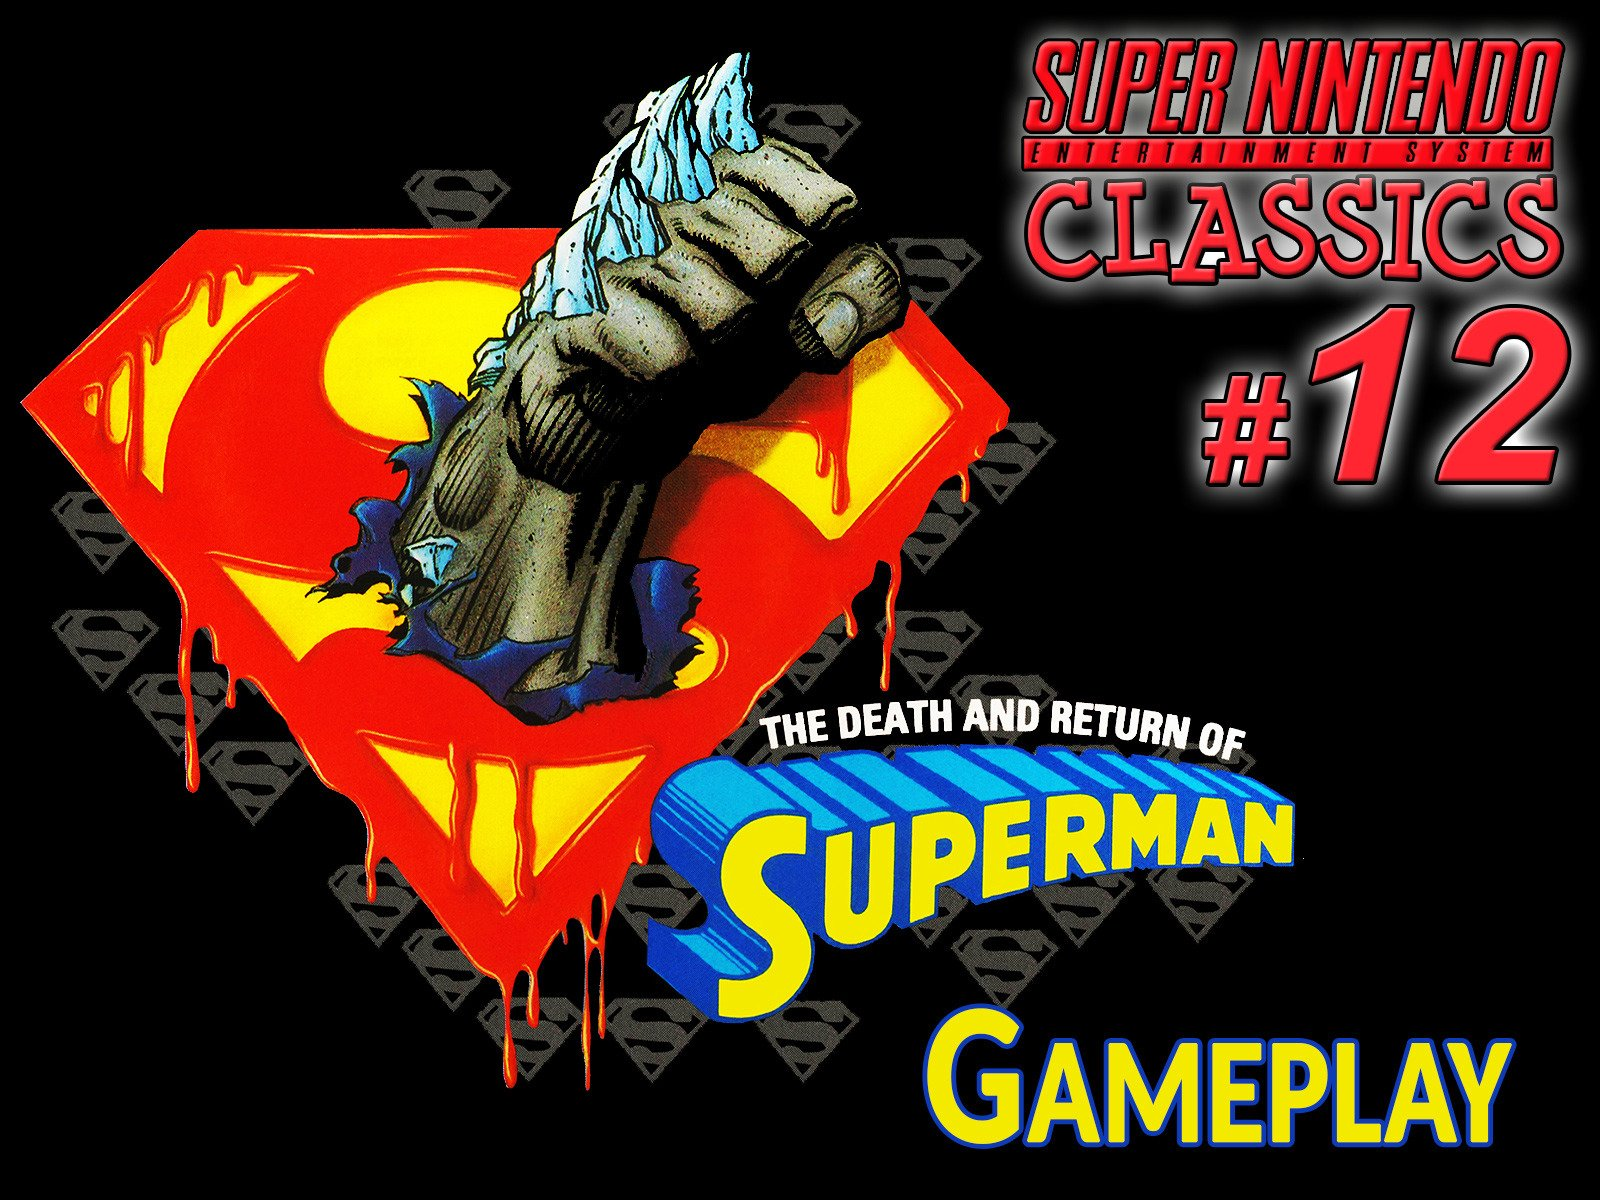 Clip: Death and Return of Superman Gameplay (SNES Classics 12) - Season 1